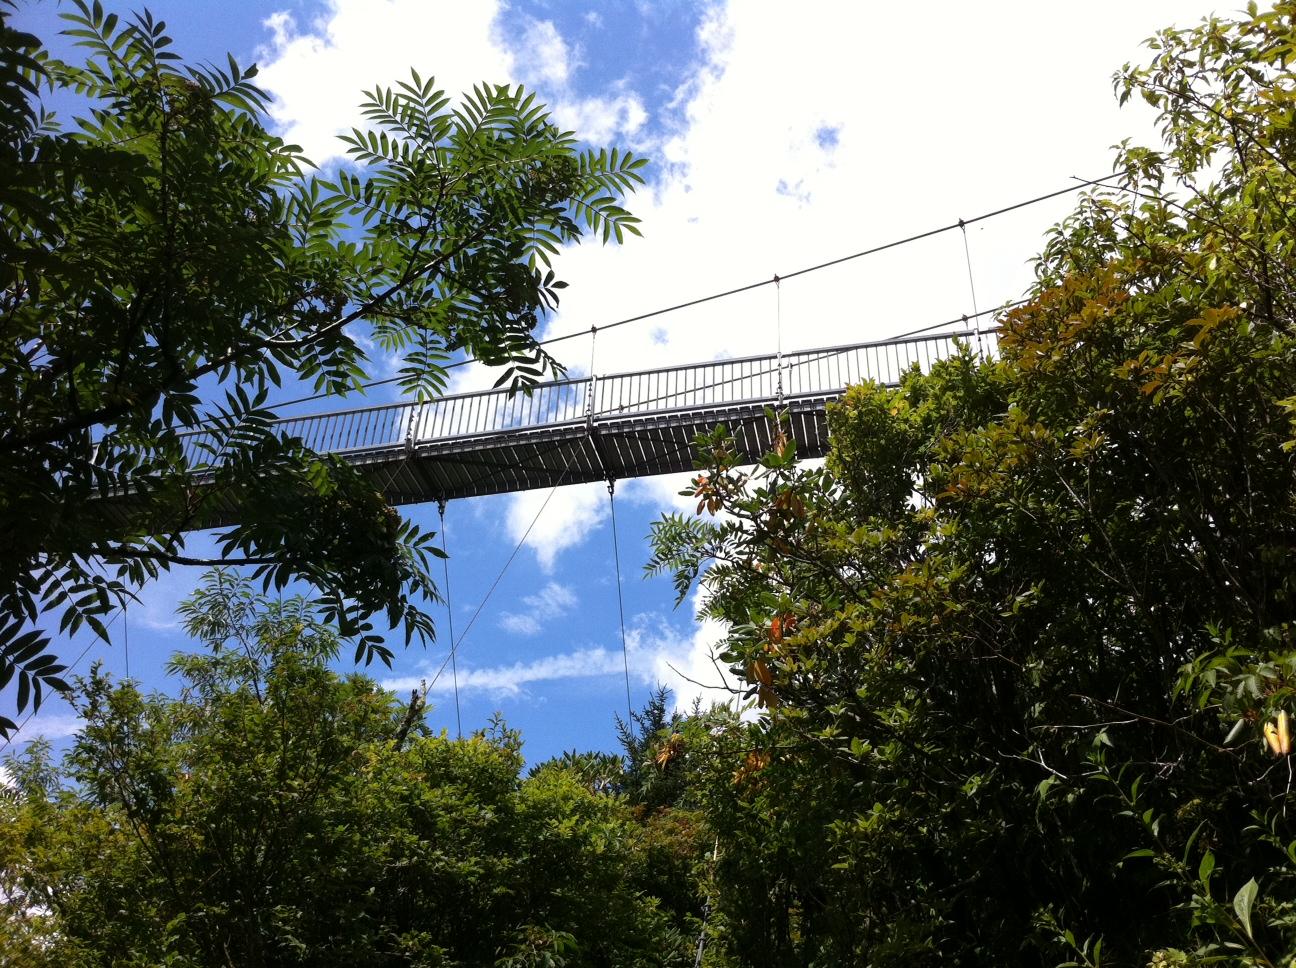 Are absolutely bridge resort swinging